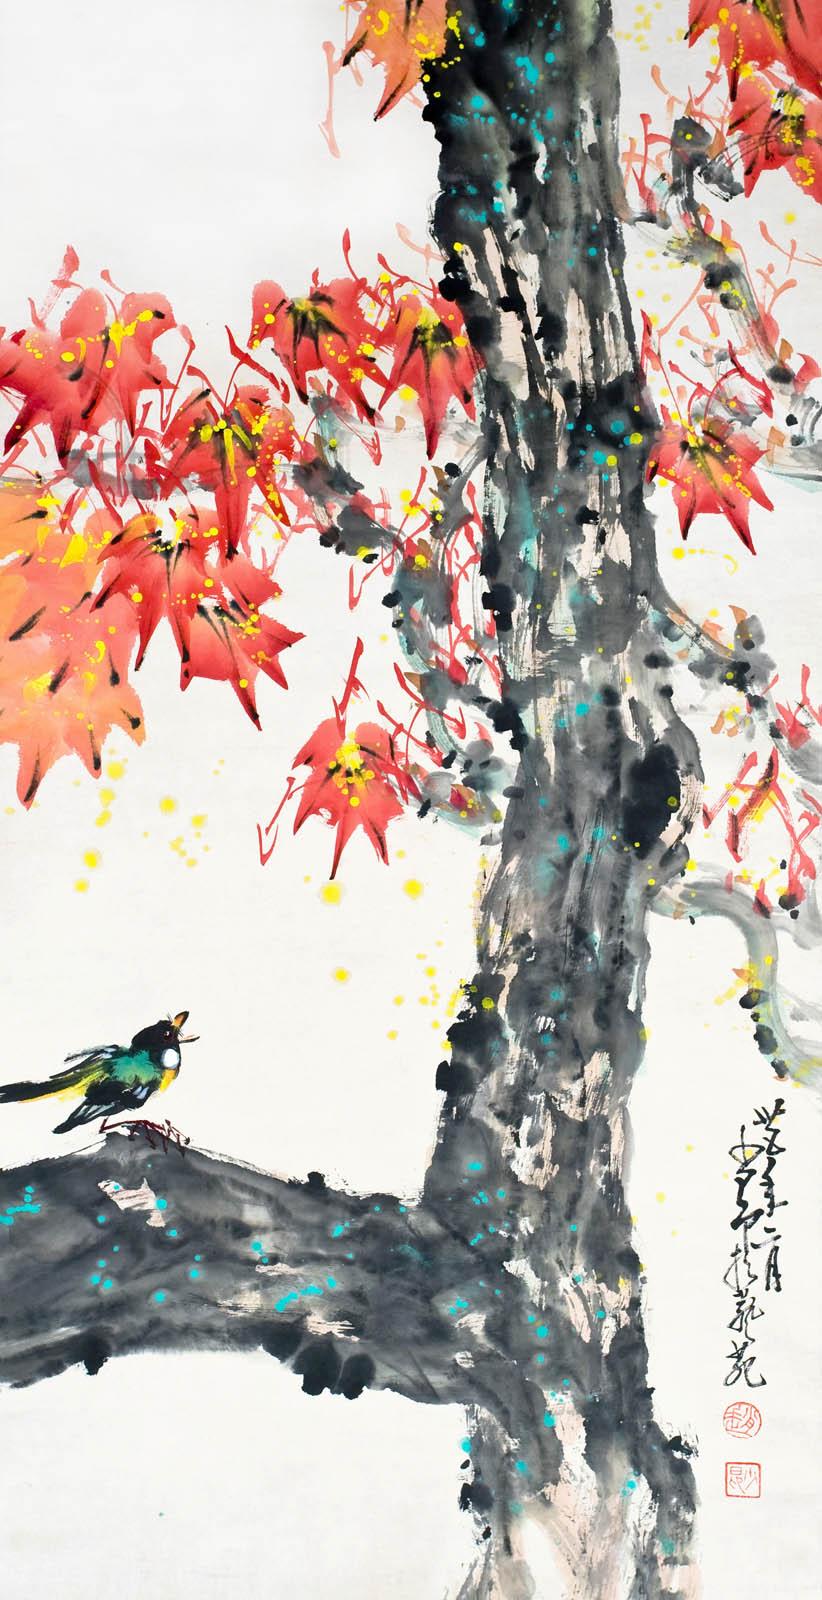 Lot 57 - 趙少昂  (1905 - 1998)  楓紅聽鳥啼  設色水墨紙本立軸  1946 年作  款識:卅五年二月少昂於藝苑  鈐印:(趙)(少昂)  Zhao Shaoang  Birds Singing